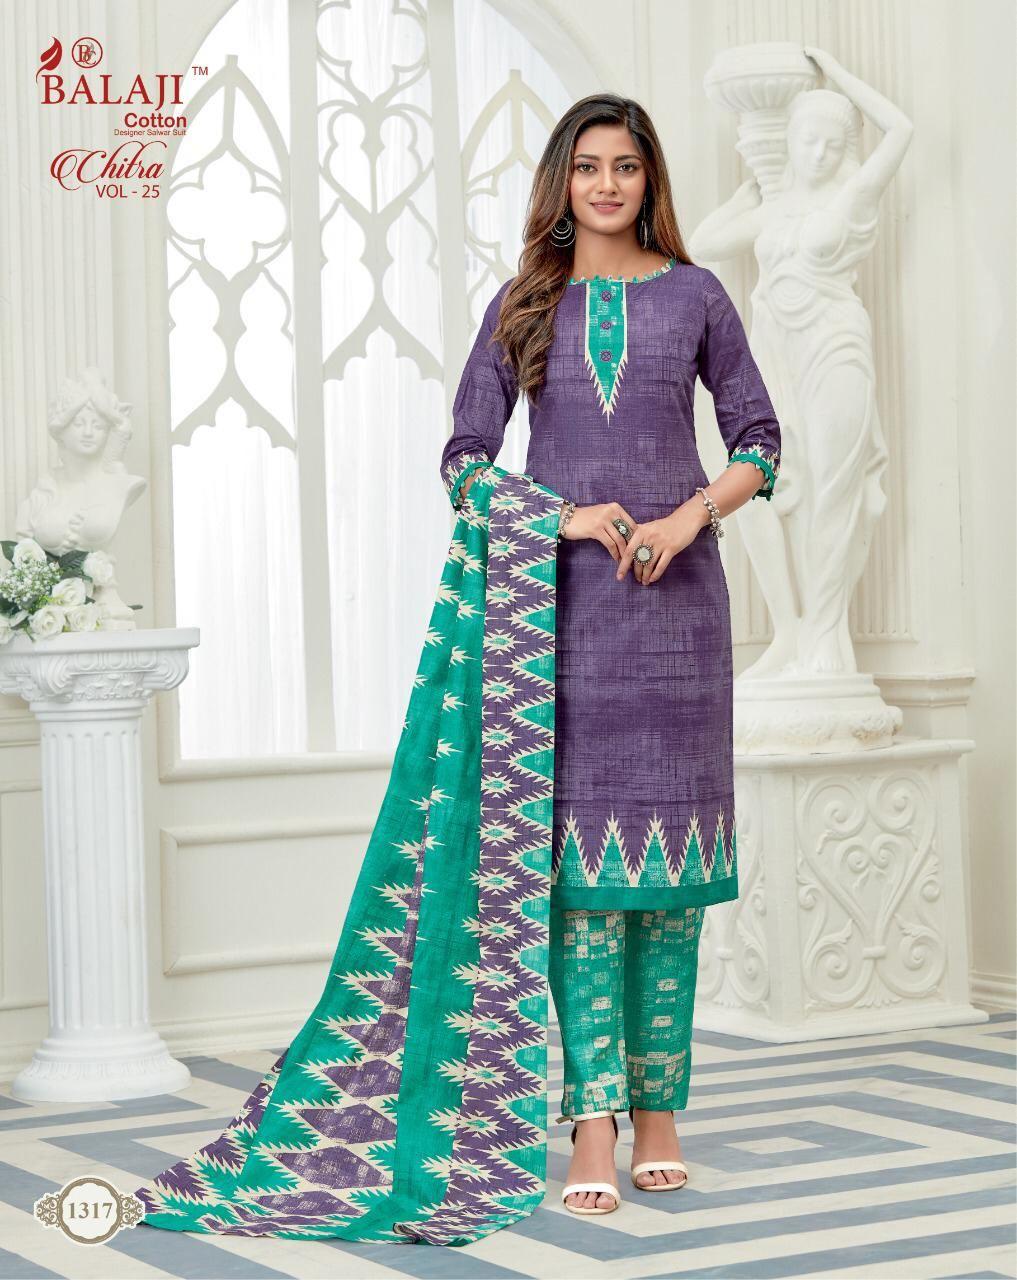 Balaji-Chitra-Vol-25-18